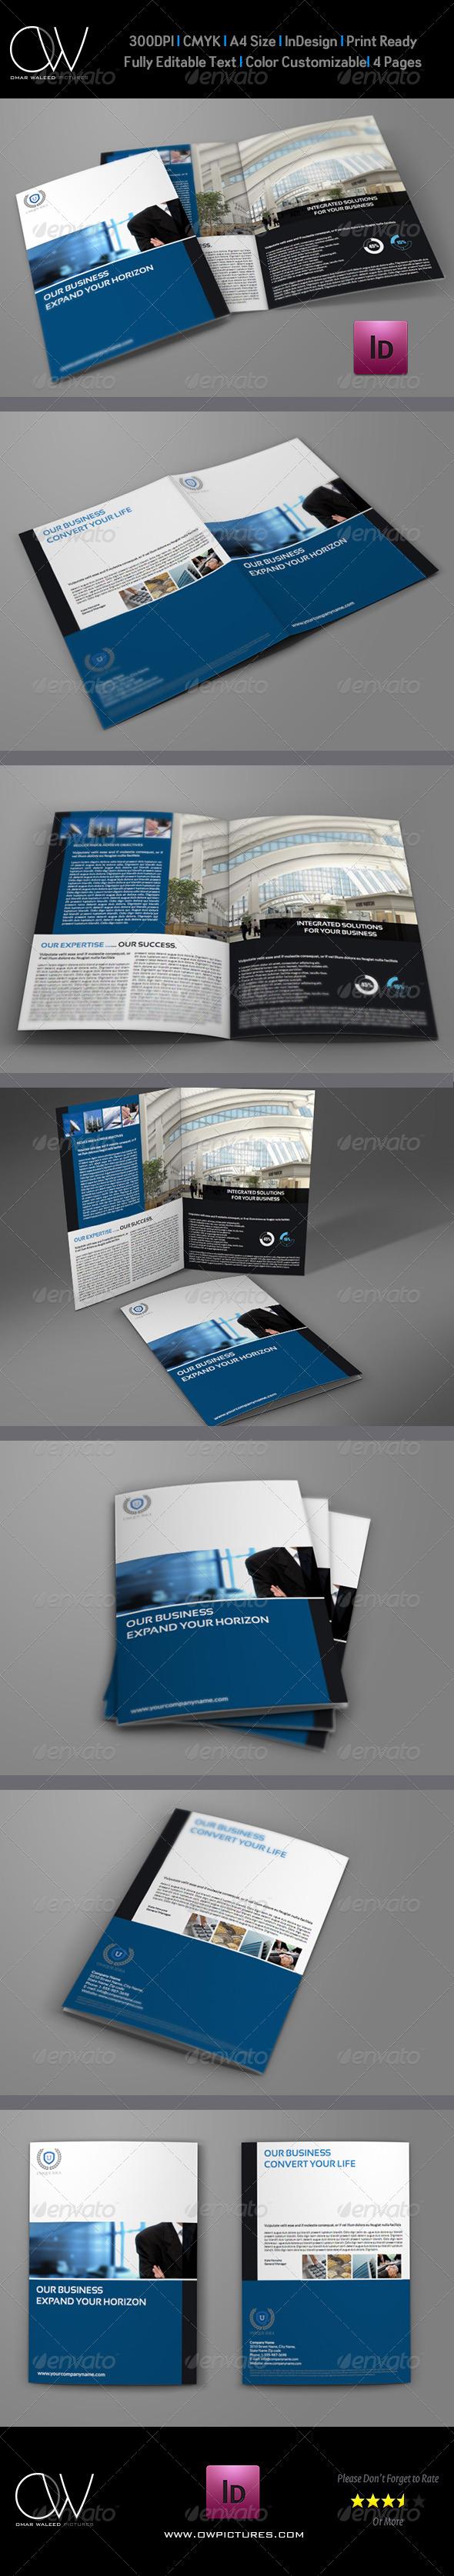 Company Brochure Bi-Fold Template Vol.7 - Corporate Brochures